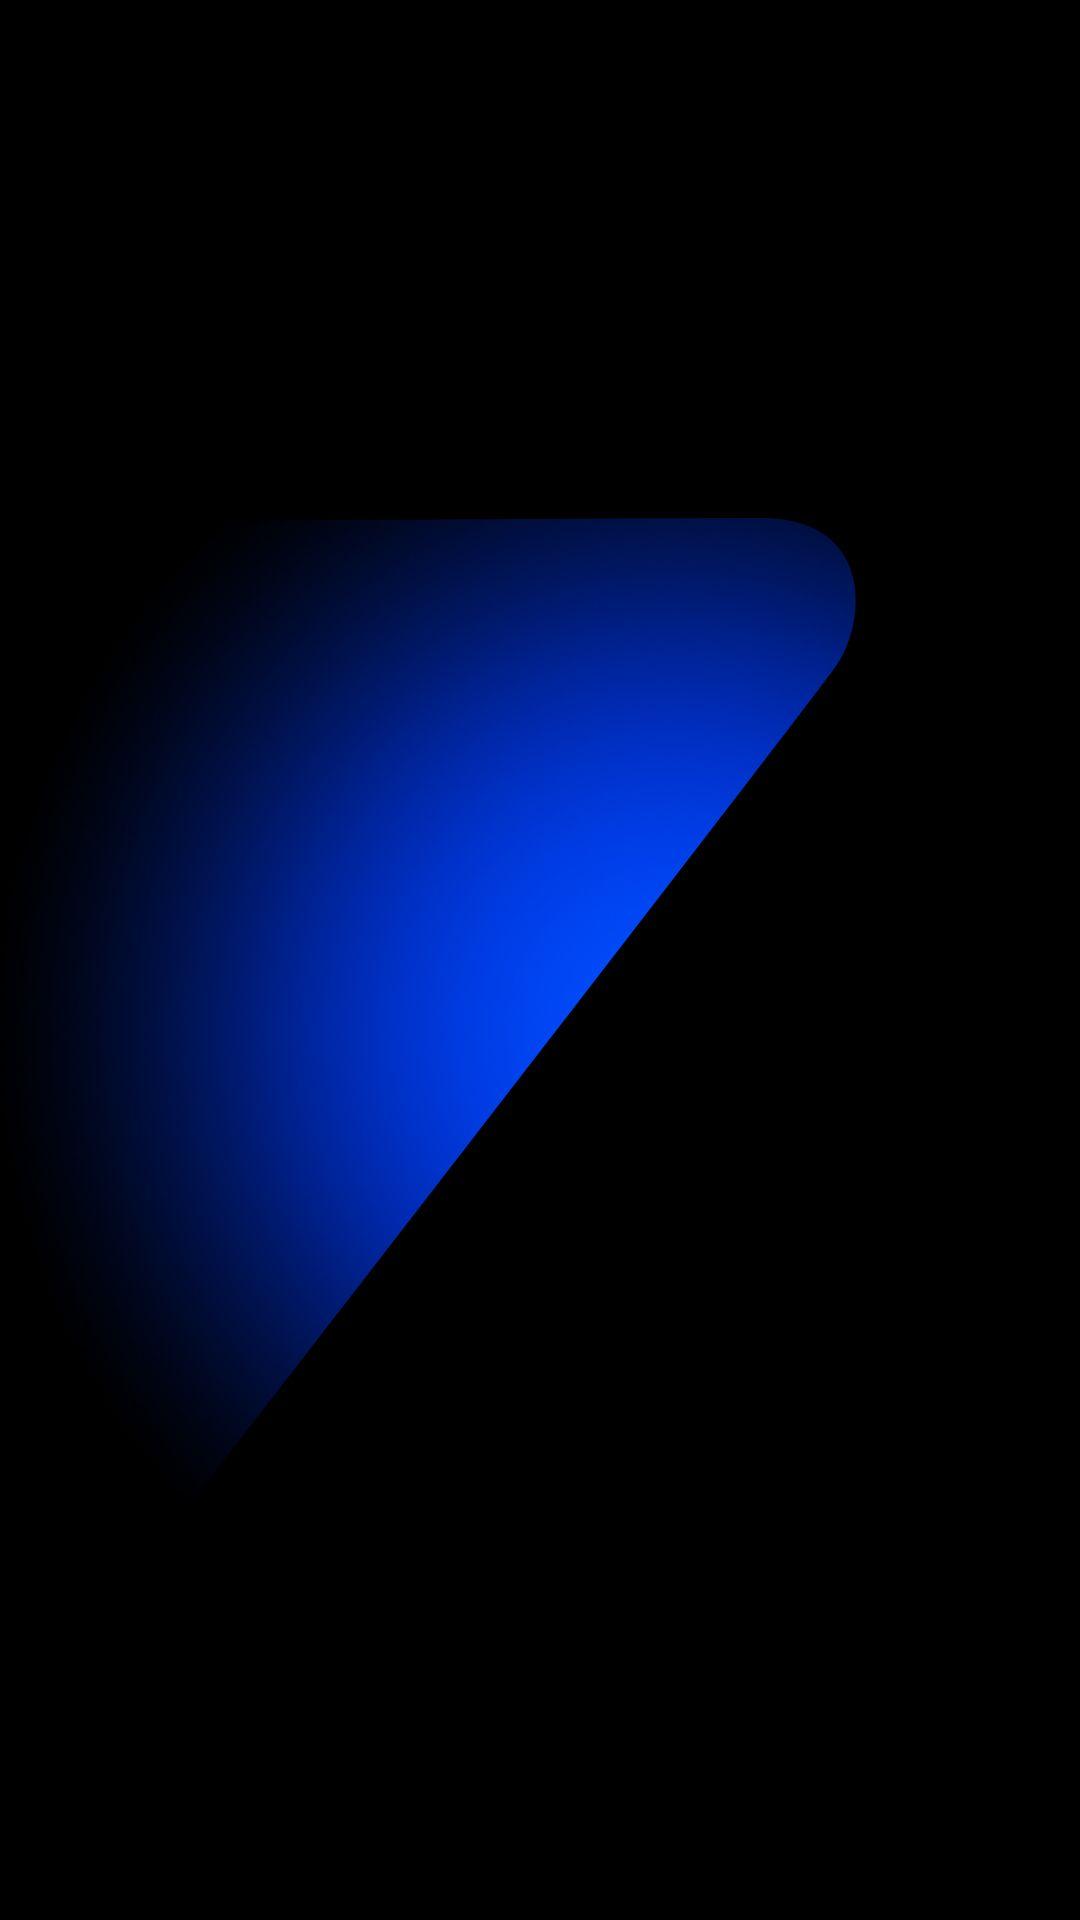 Samsung Galaxy S7 Edge lock screen wallpaper Wallpaper ponsel 1080x1920